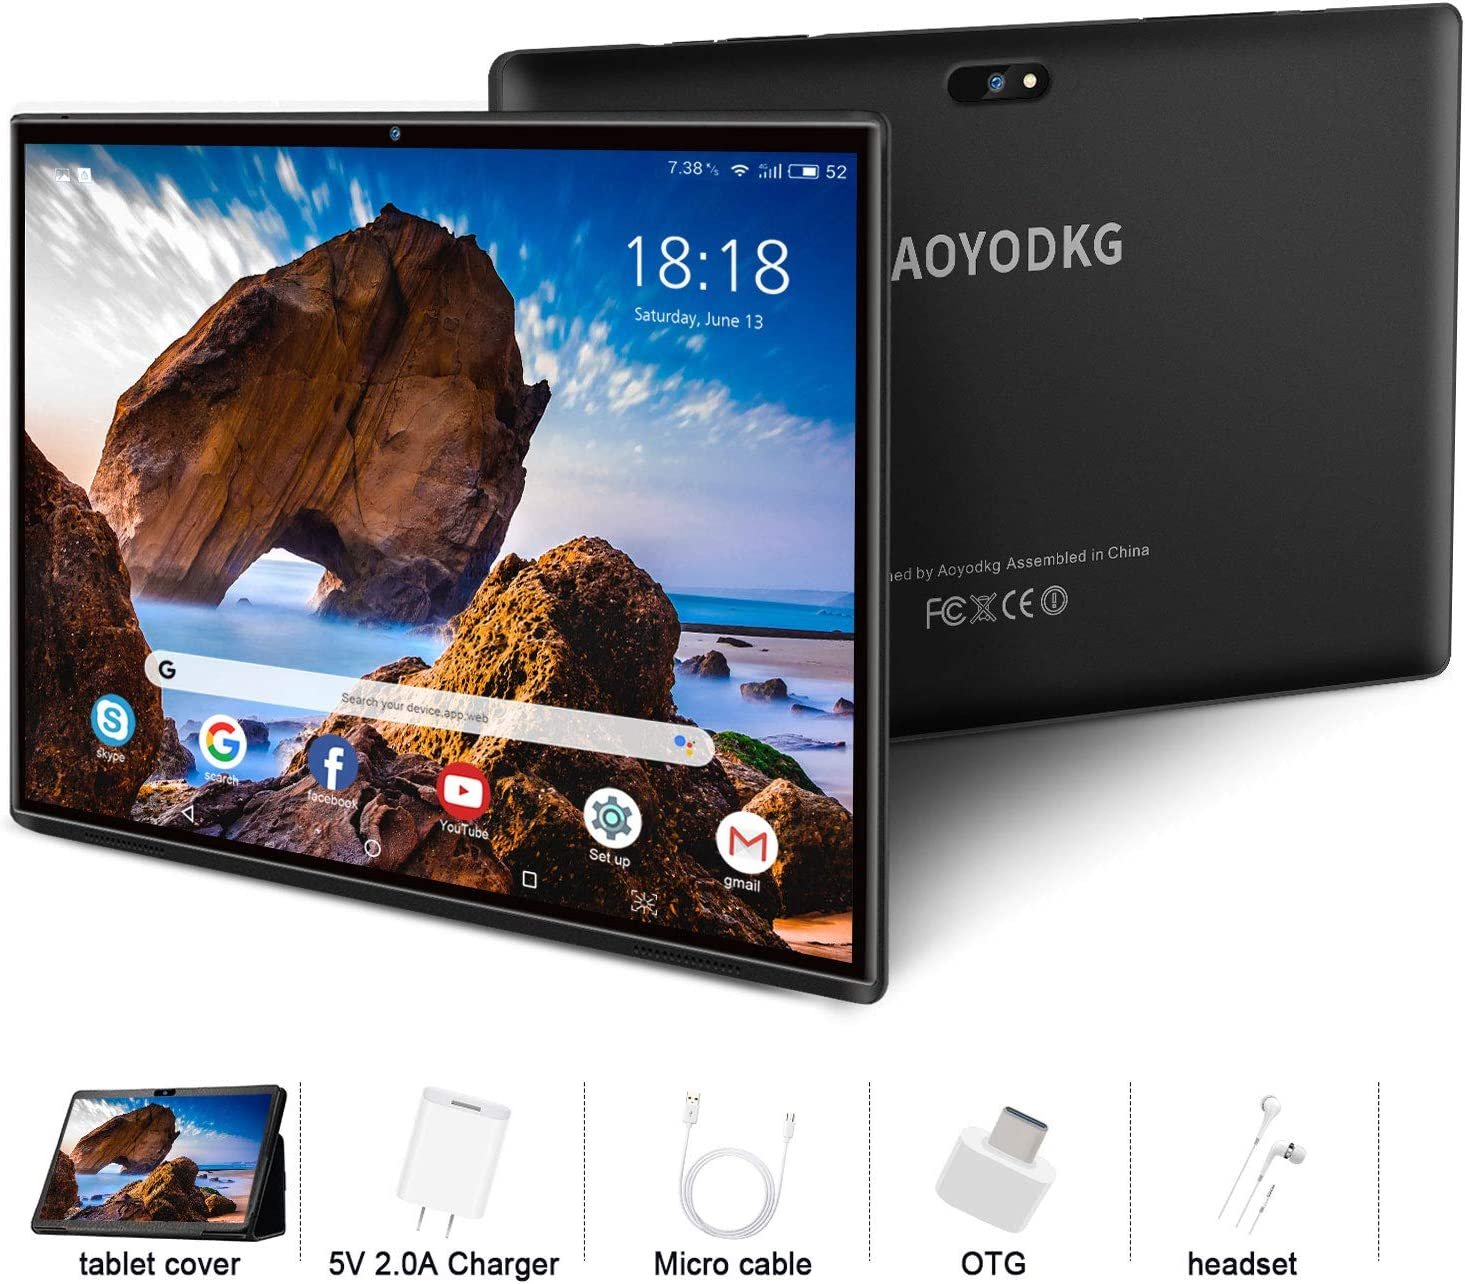 Tablet 10.1 Pulgadas 4G LTE Call ,Android 9.0 Google Certificación GMS Tablets,3Go RAM + 32/128Go ROM ,Quad Core ,8000mAh Batterie,5MP +8MP, WiFi /GPS /OTG/ Bluetooth /Netfilix Tablet PC